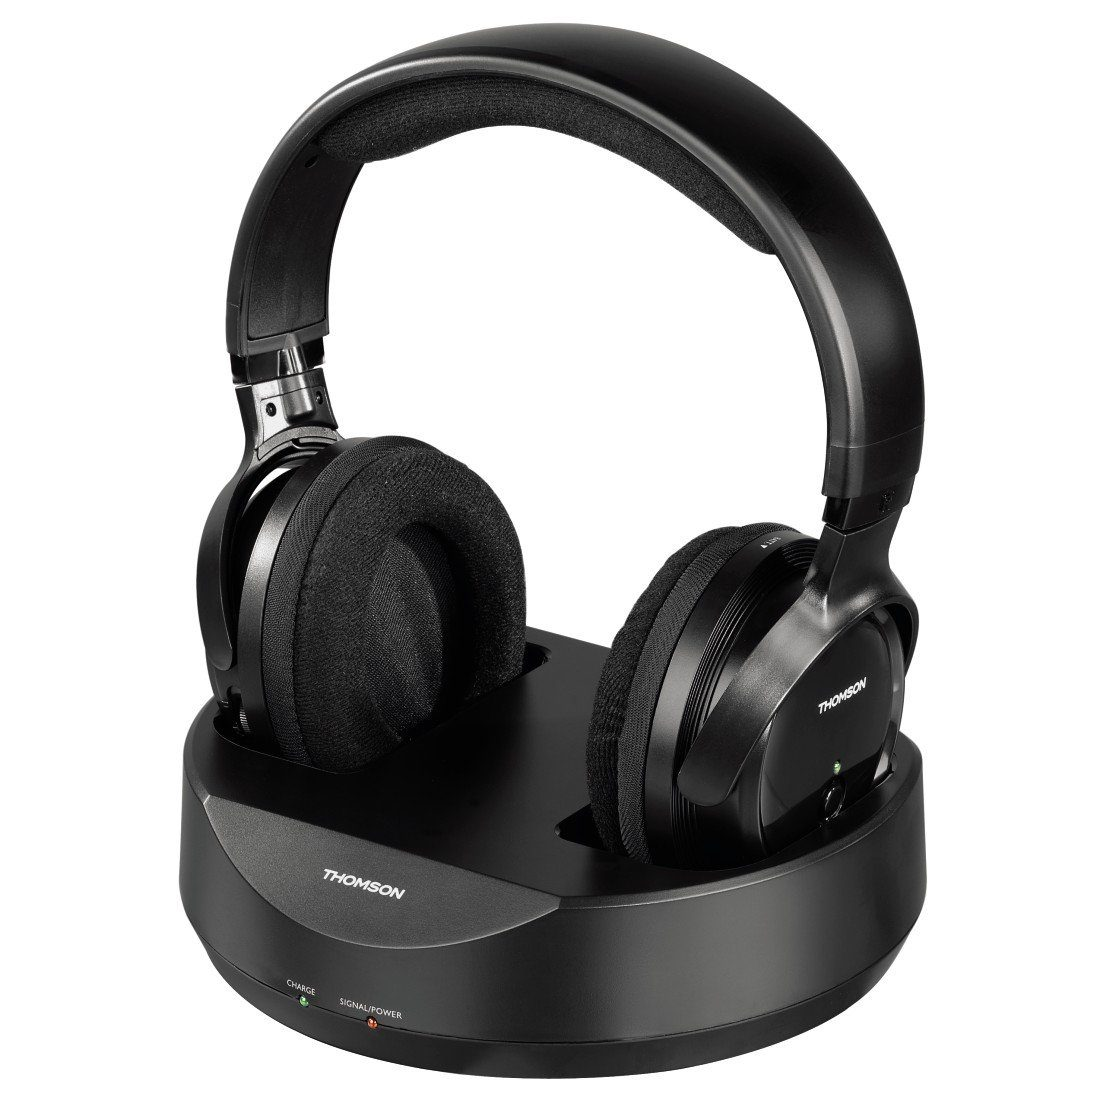 Thomson Funkkopfhörer WHP3001BK kabelloser Over-Ear Kopfhörer »für TV, Fernseher, PC, HiFi«